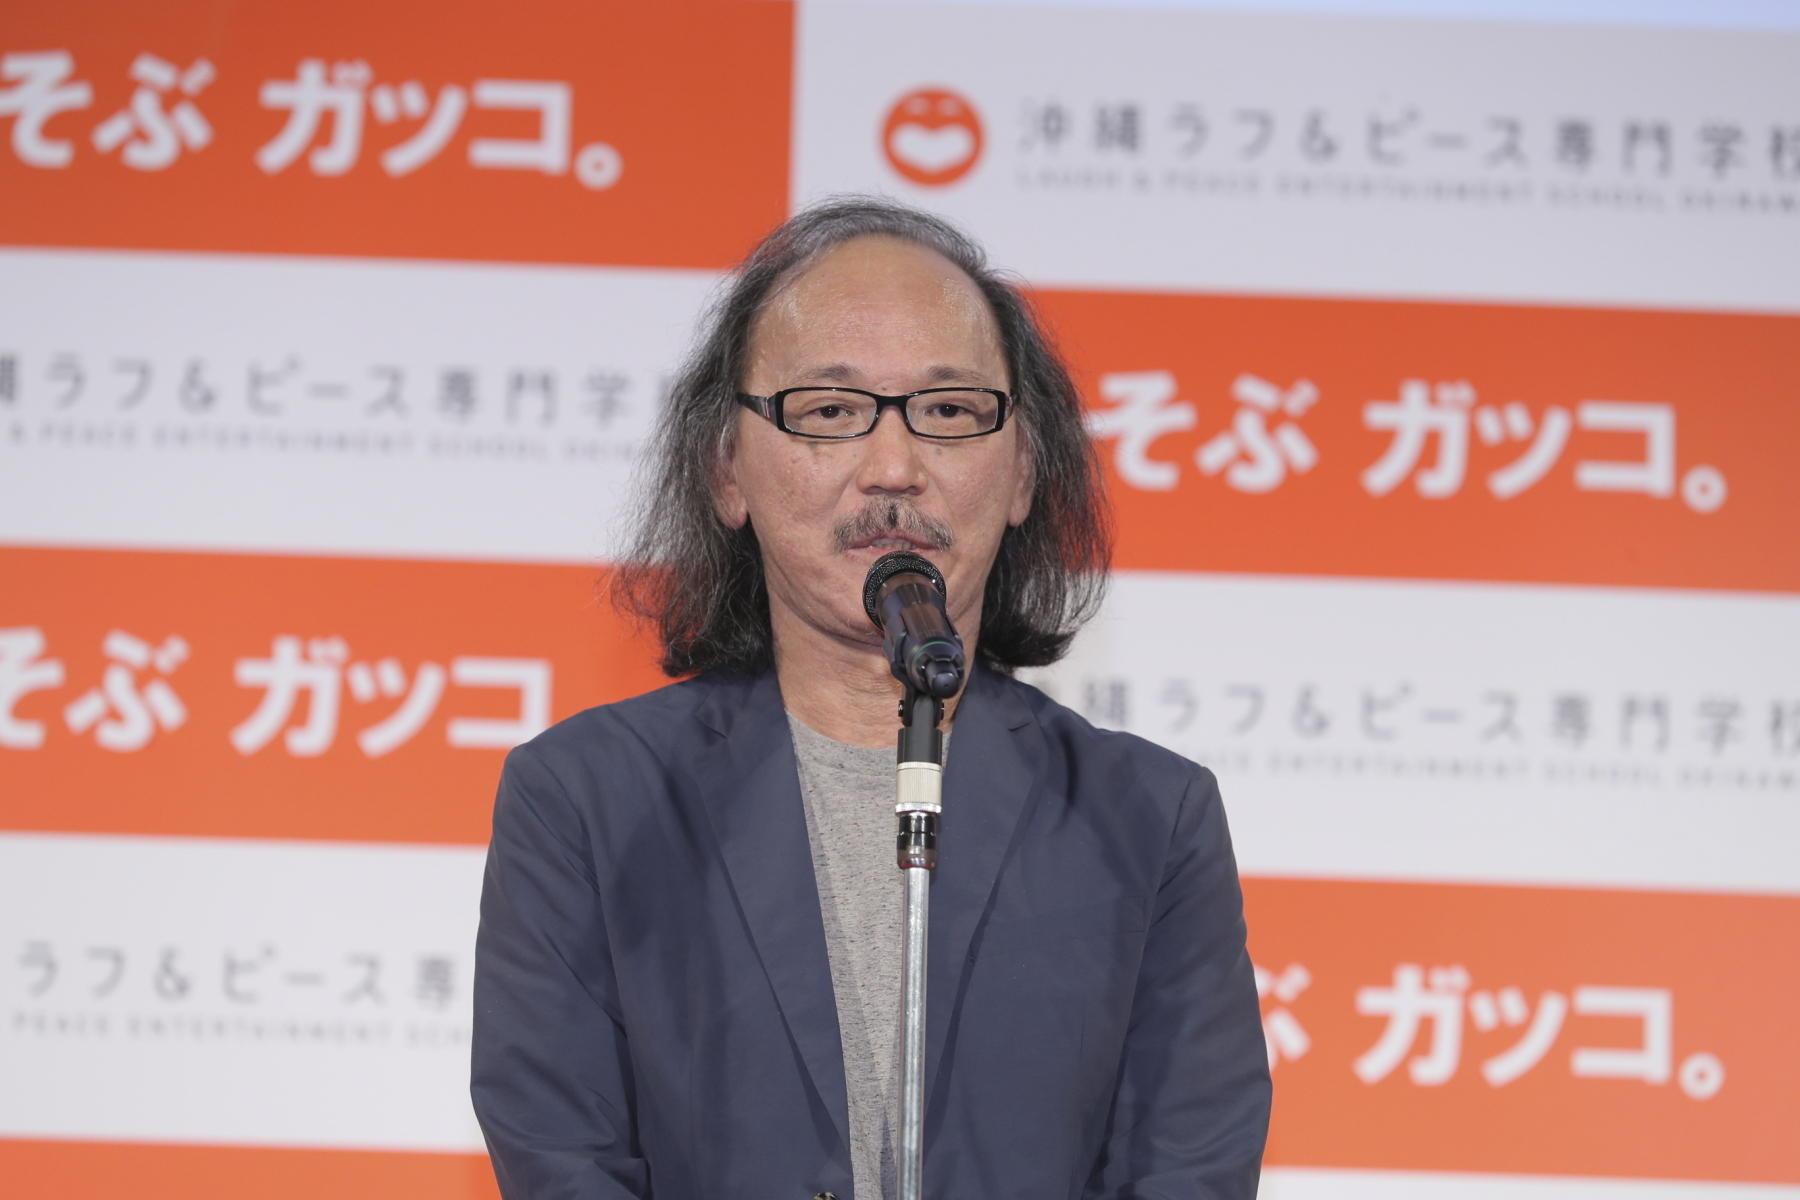 http://news.yoshimoto.co.jp/20171006102446-4a3ffdb89a3f911459e1c0fcef291a47ad357526.jpg